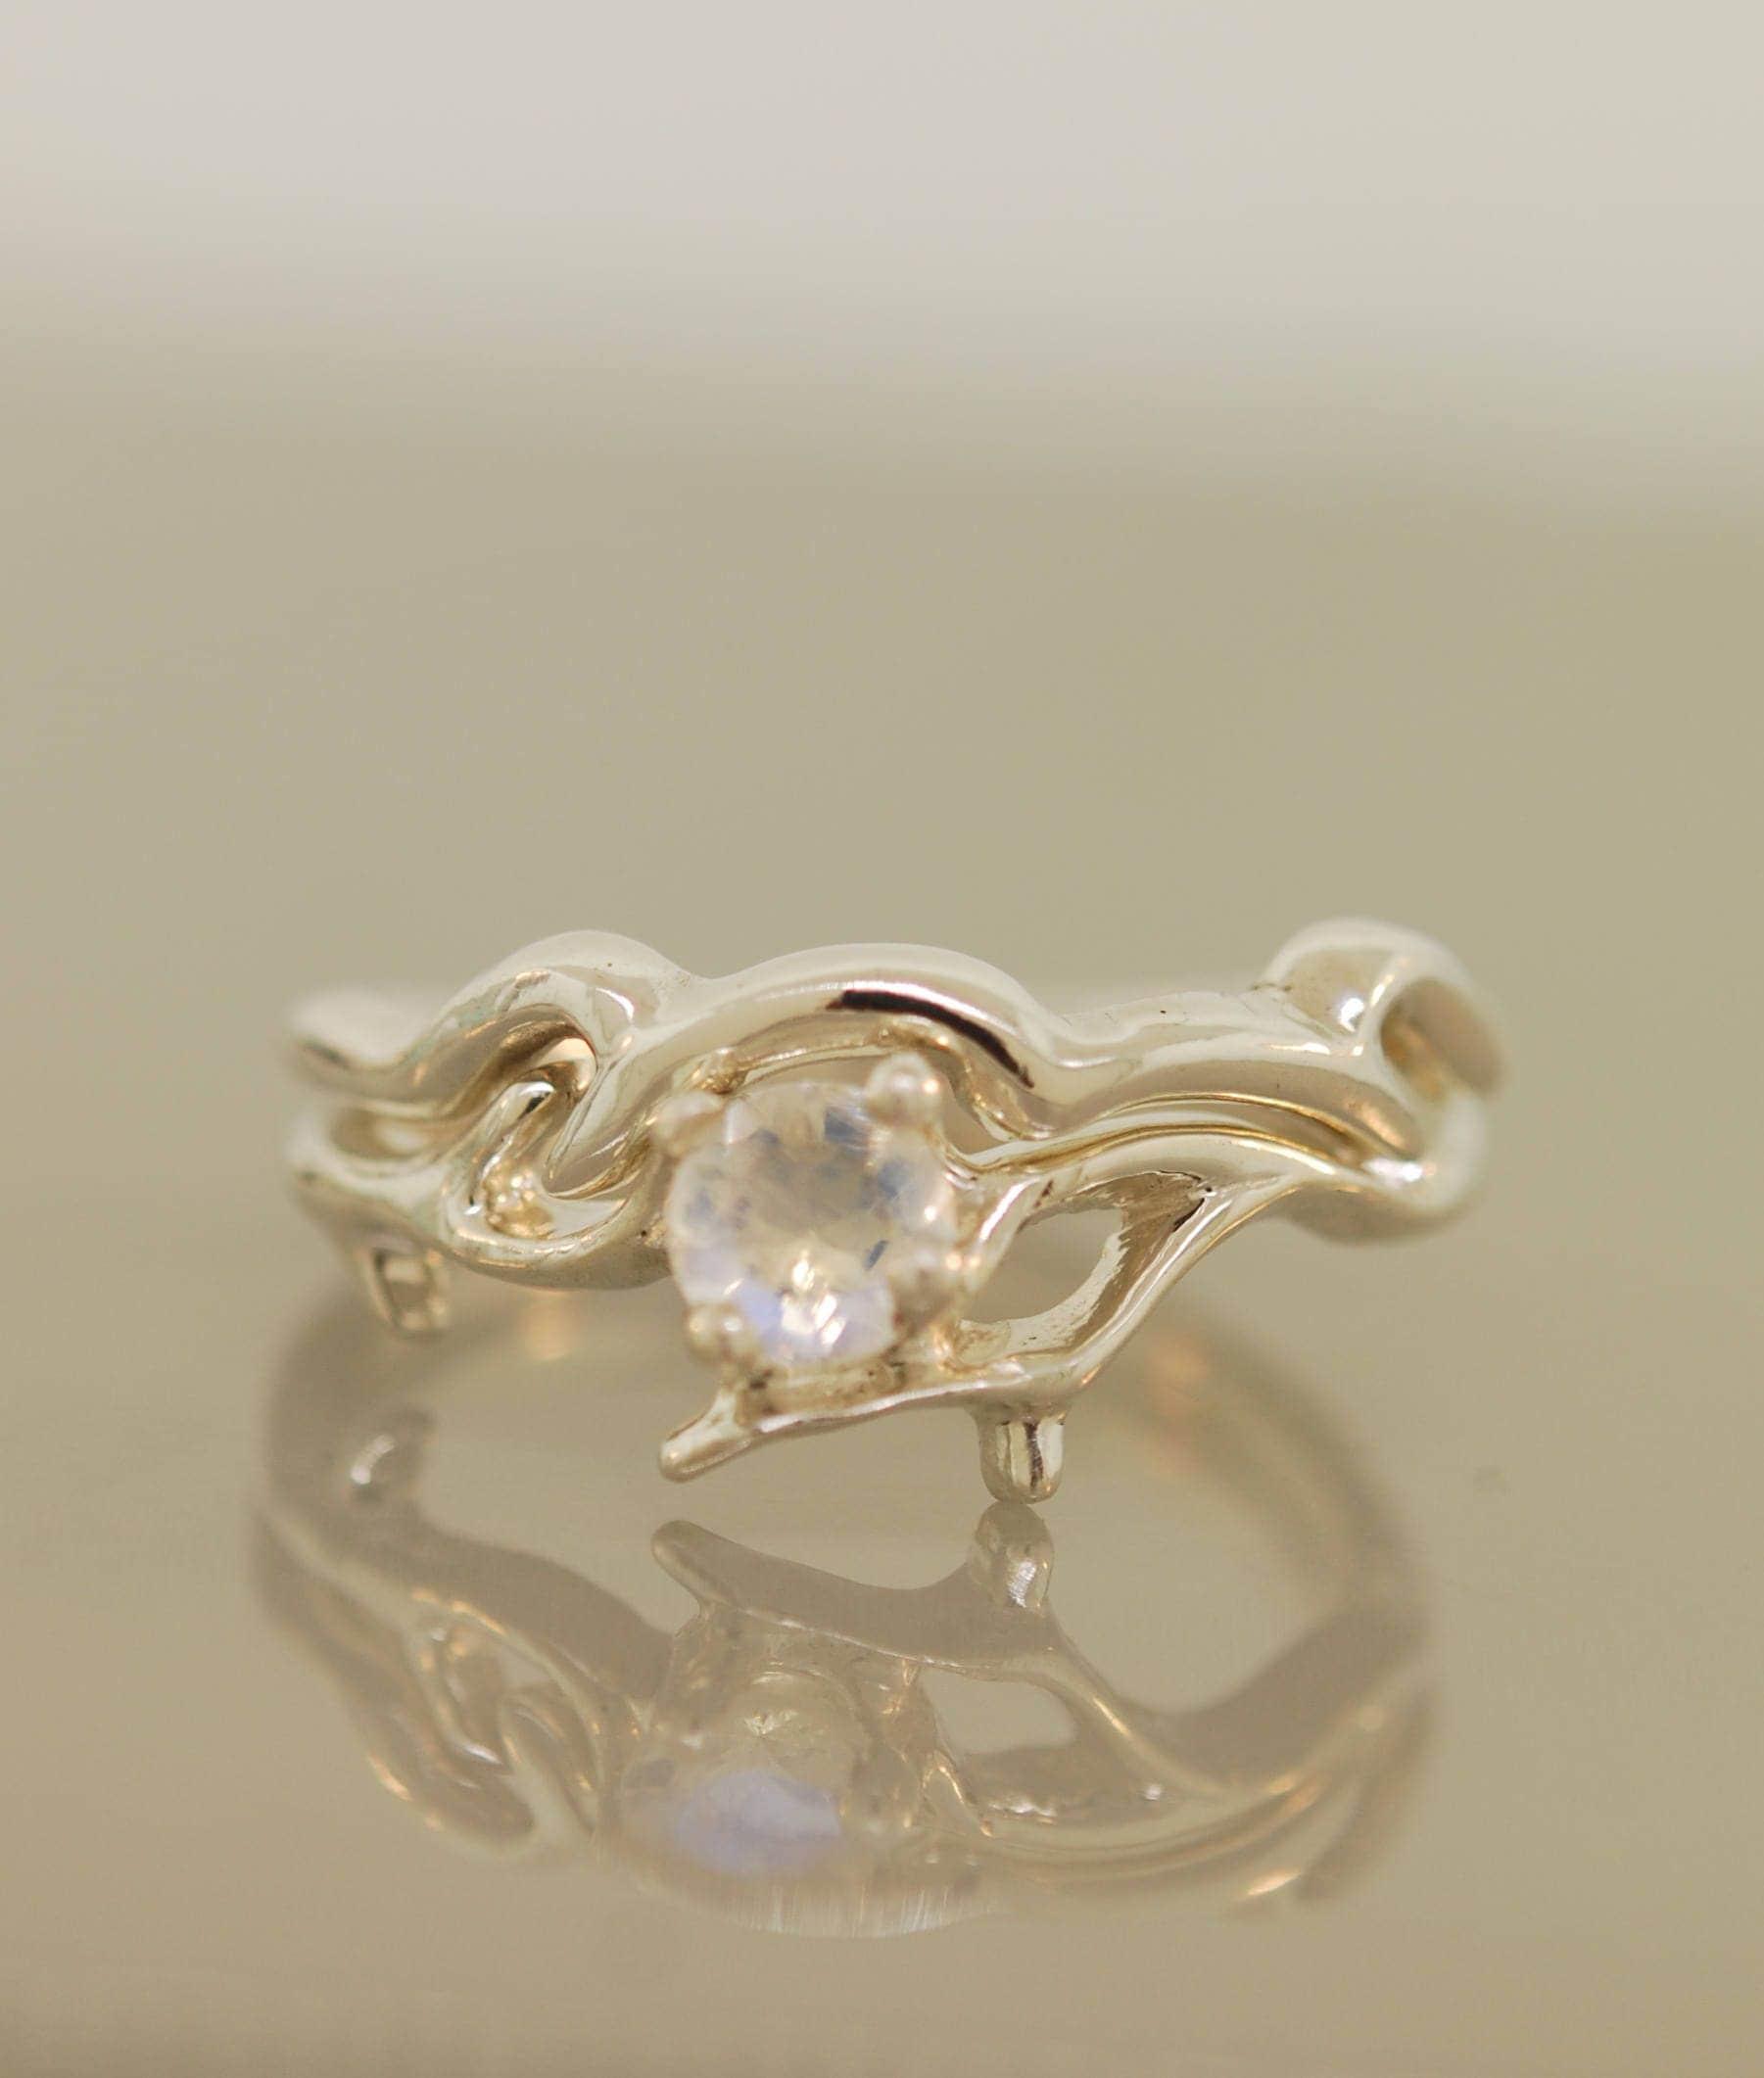 An Elegant Twig engagement ring alternative engagement ring